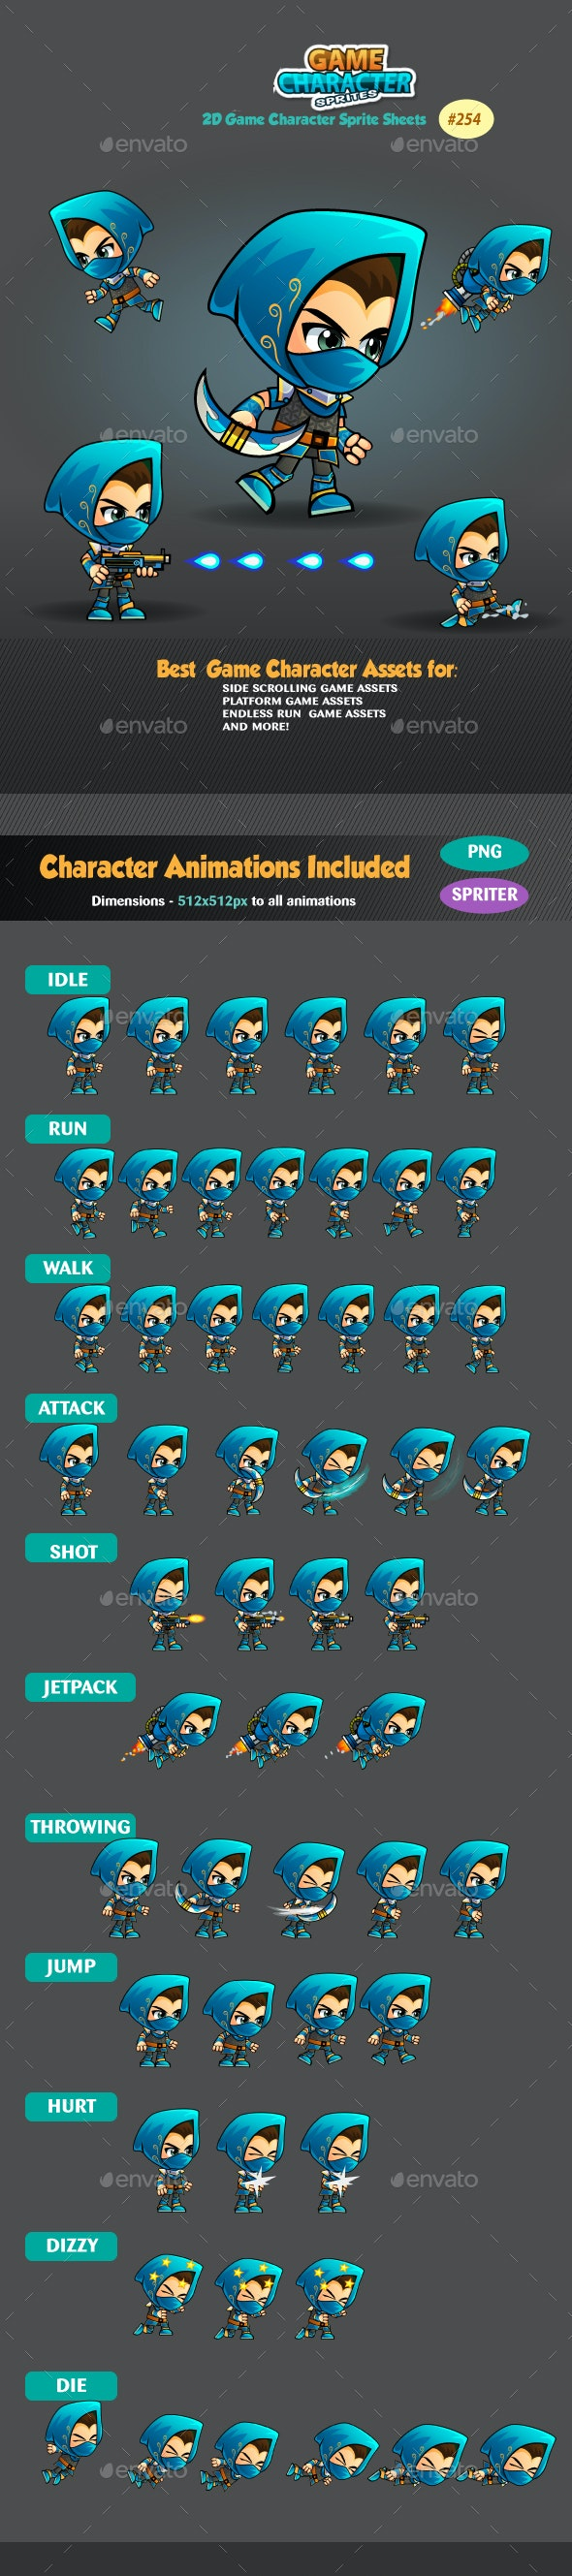 Assassin 2 Game Character Sprites 254 - Sprites Game Assets